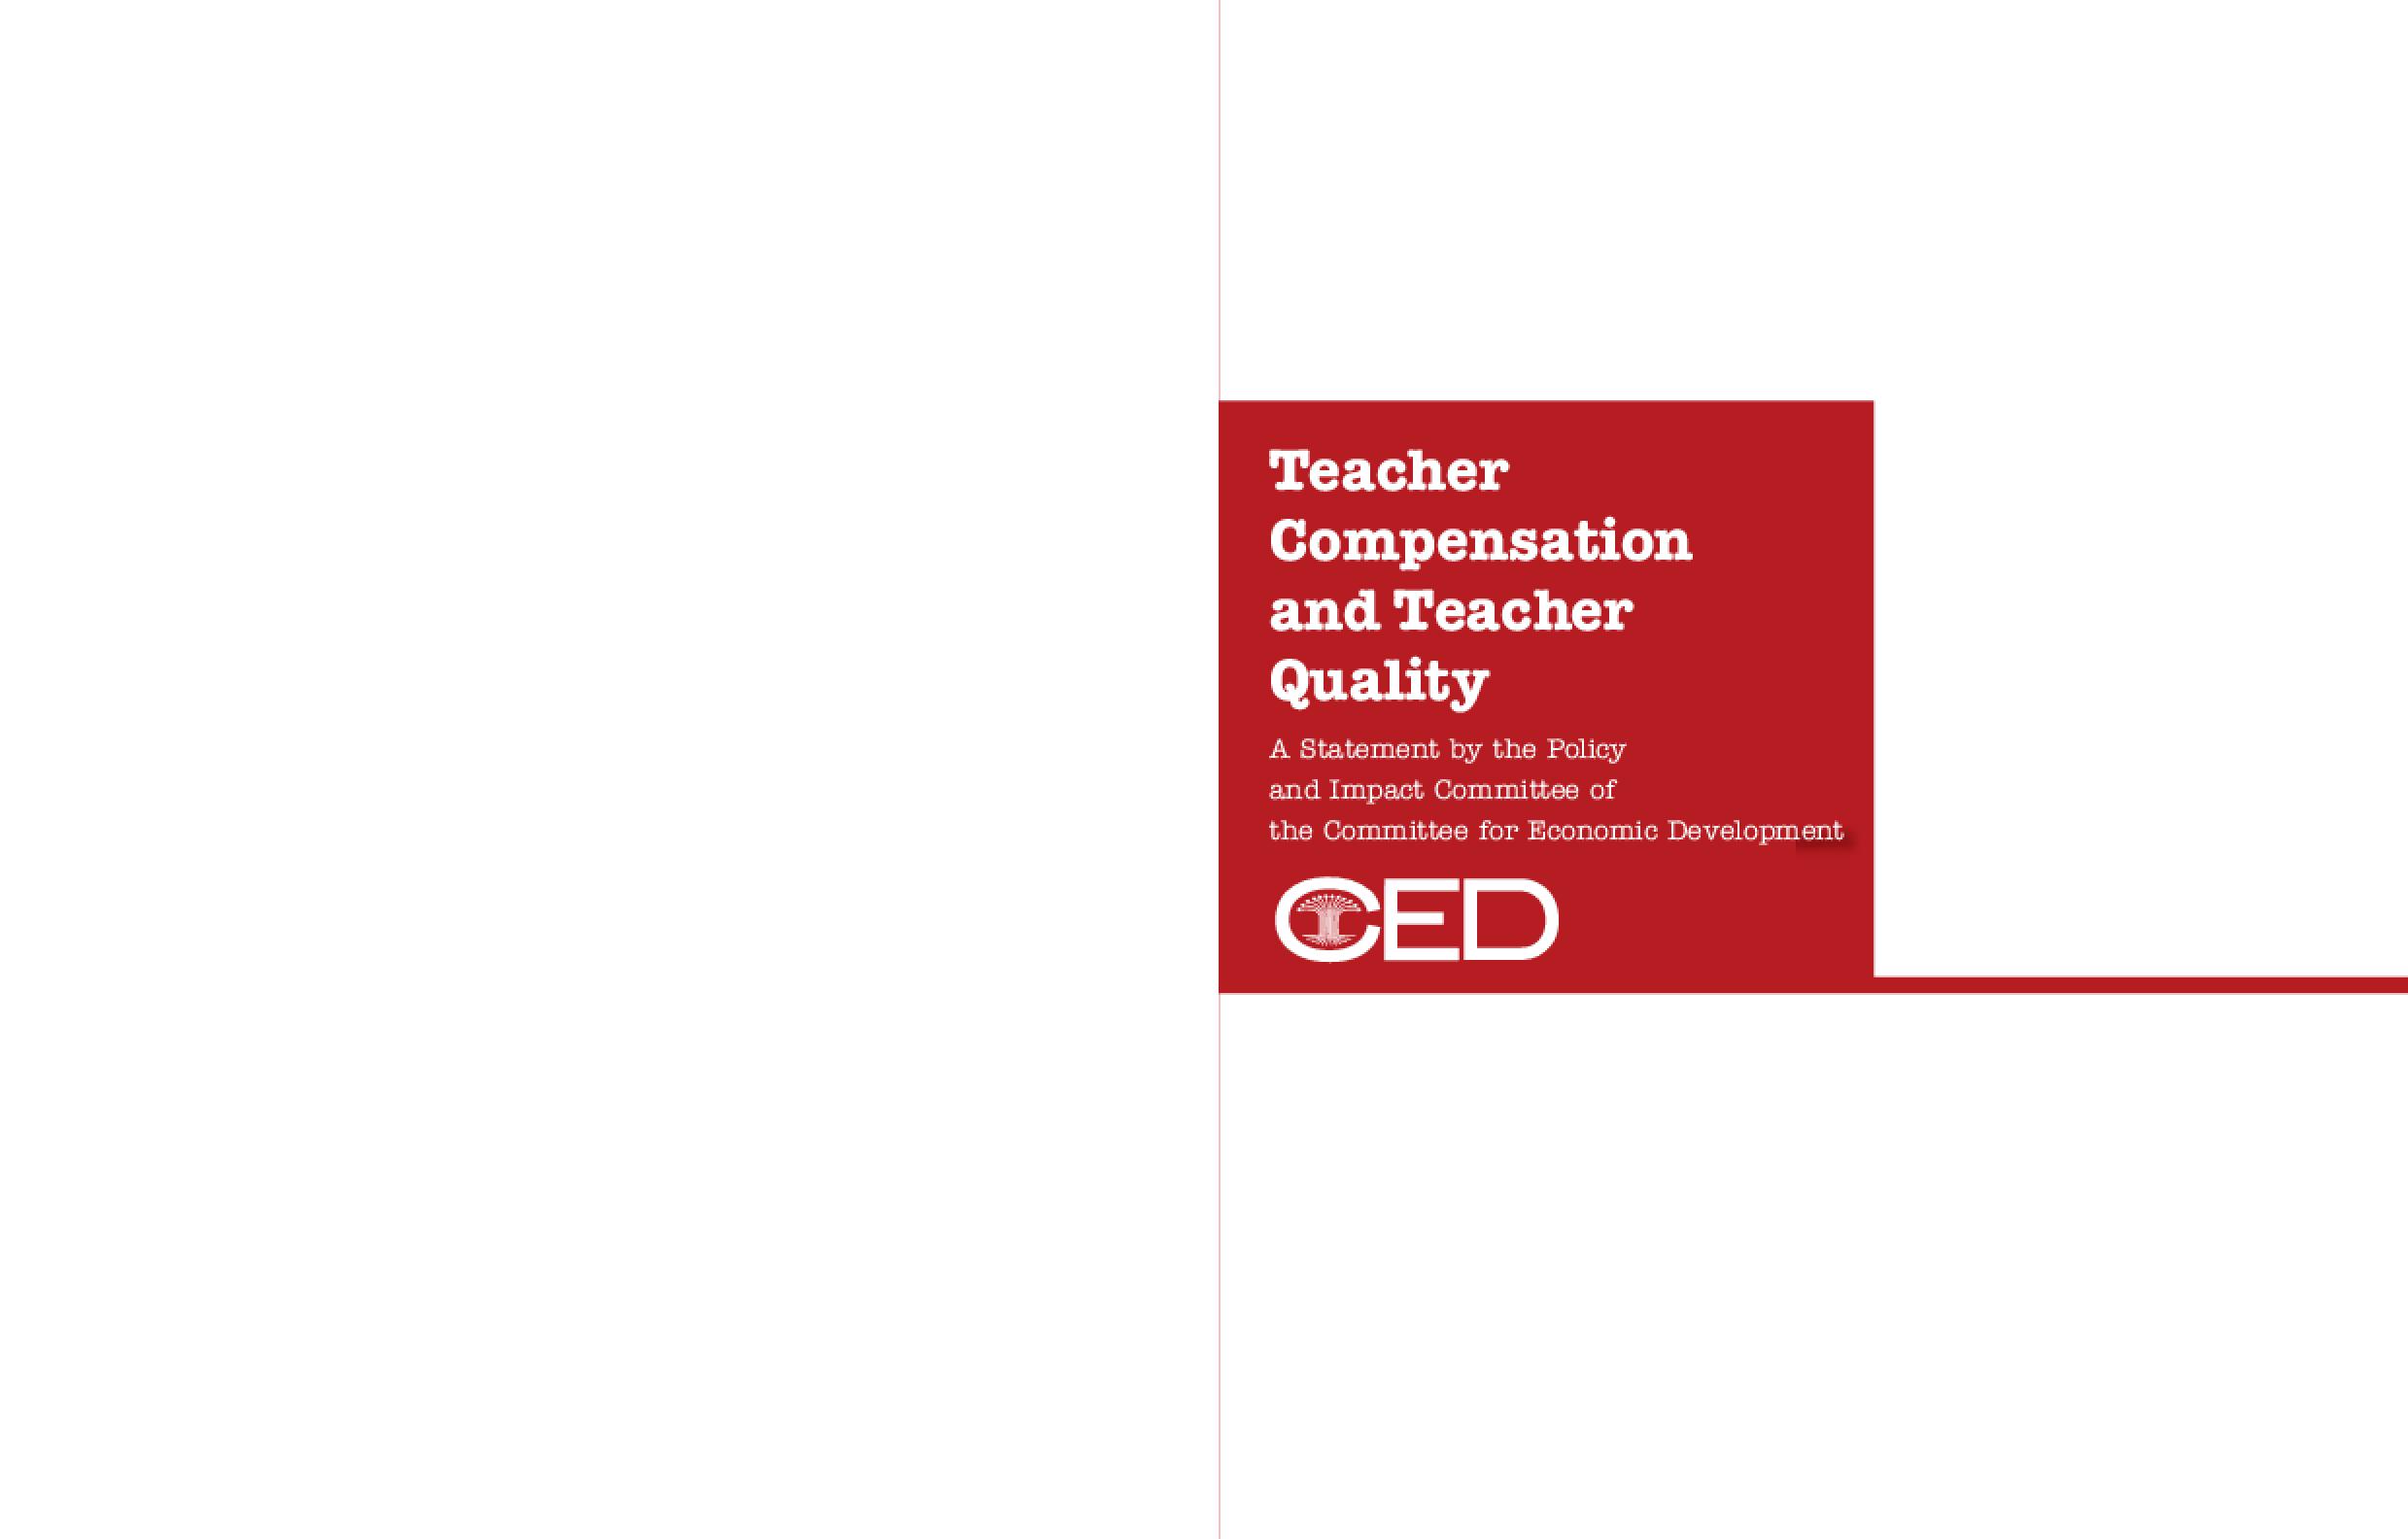 Teacher Compensation and Teacher Quality